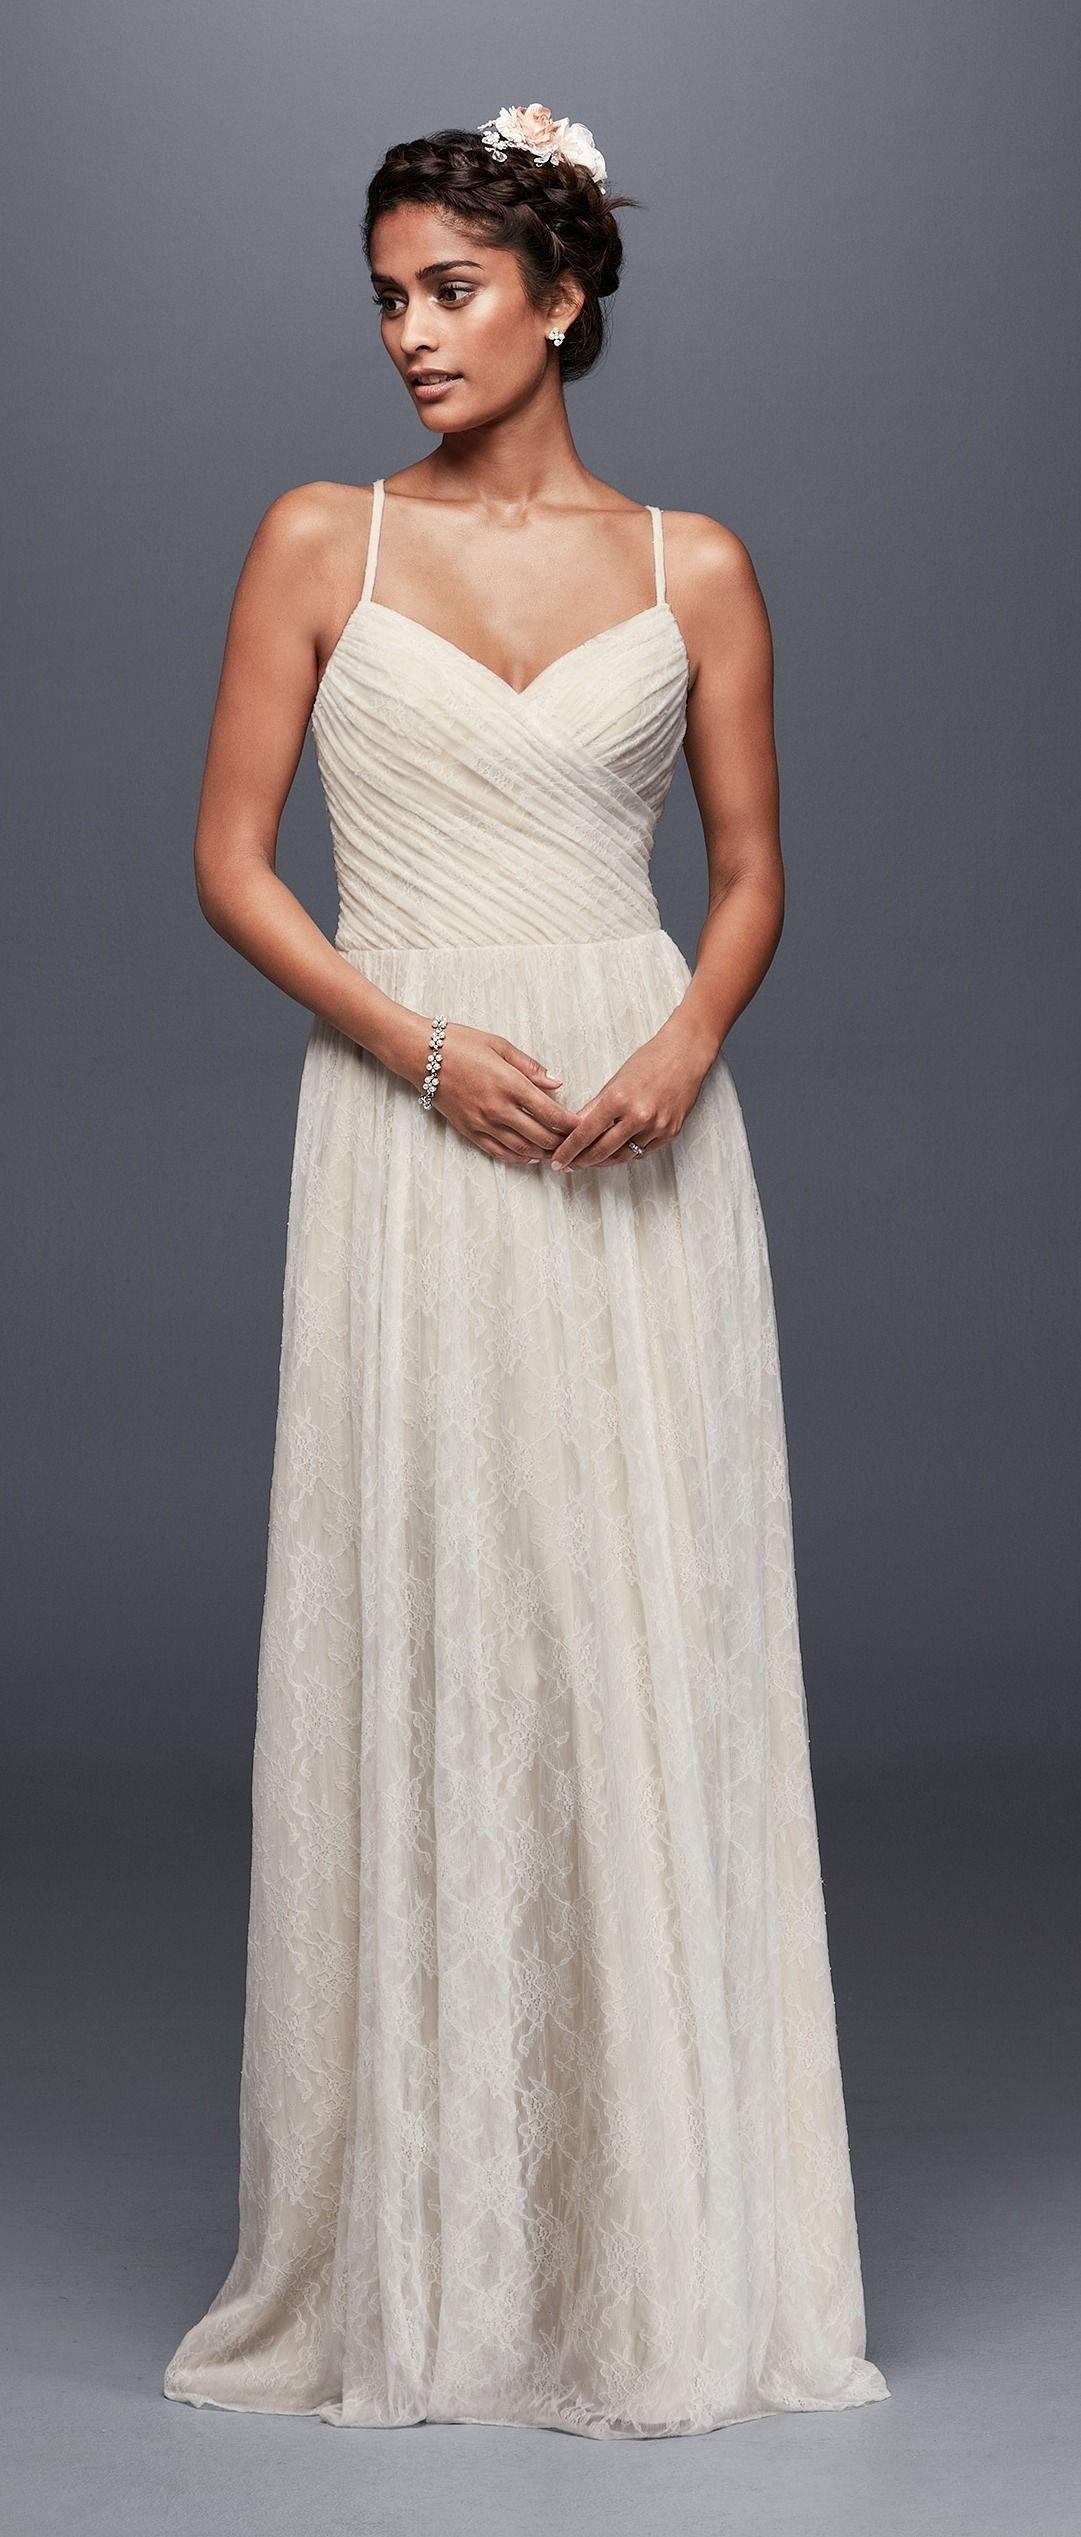 Spaghetti Strap Sweetheart Neckline Soft Lace Wedding Dress with ...